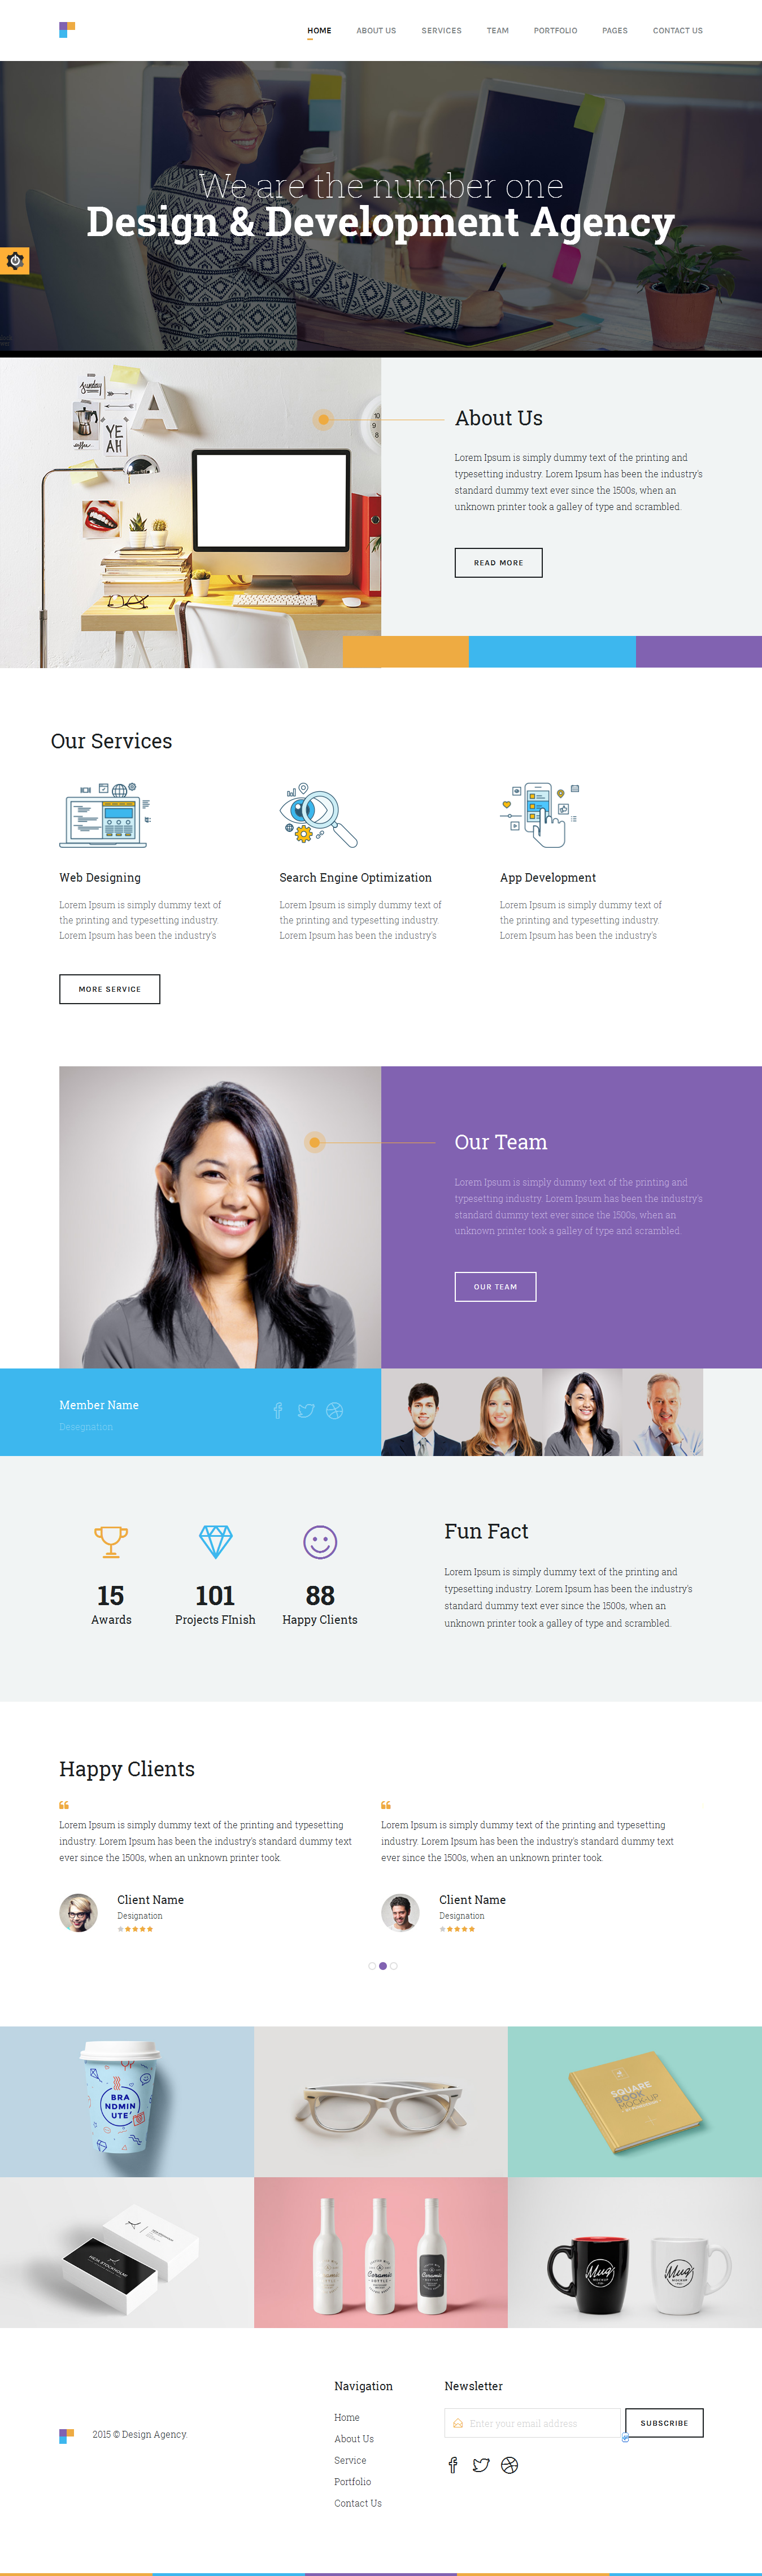 Revolution Slider Supported Digital Agency HTML5 Template